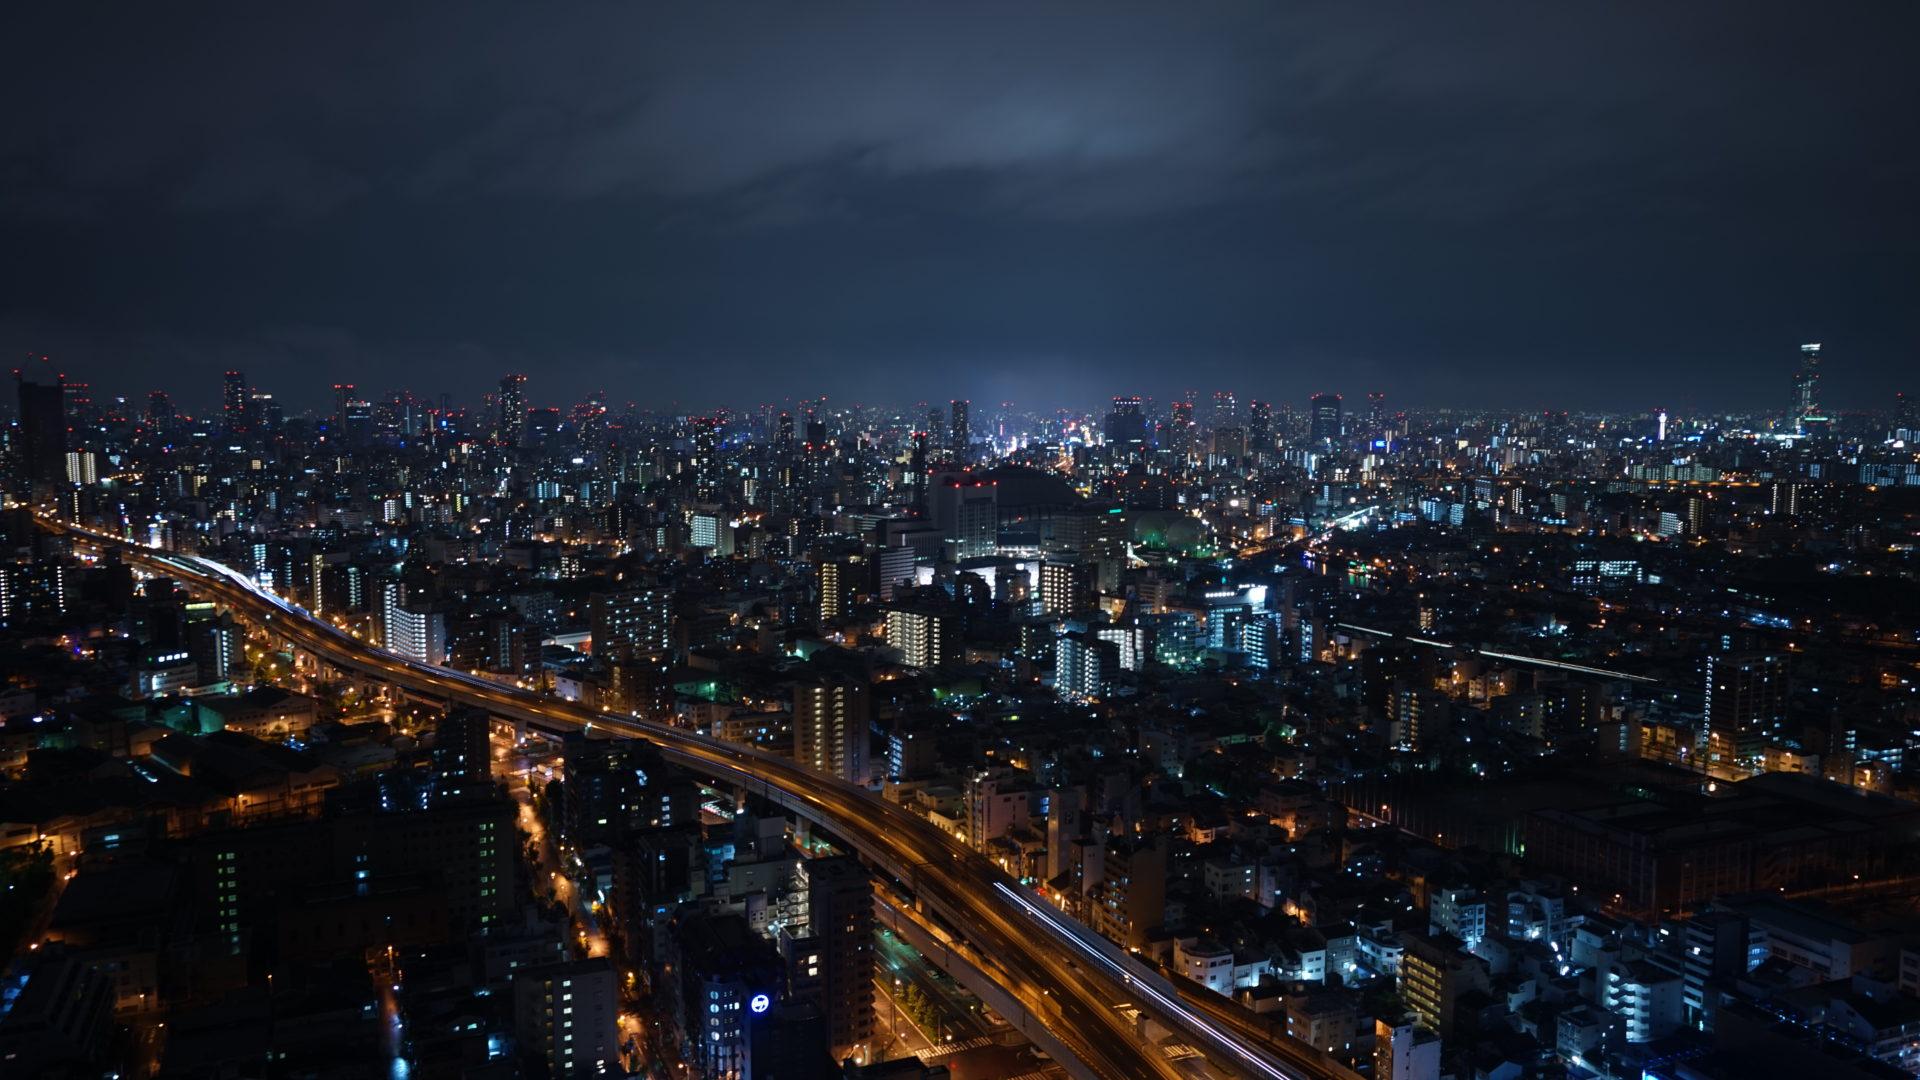 大阪の夜景と伊丹空港撮影